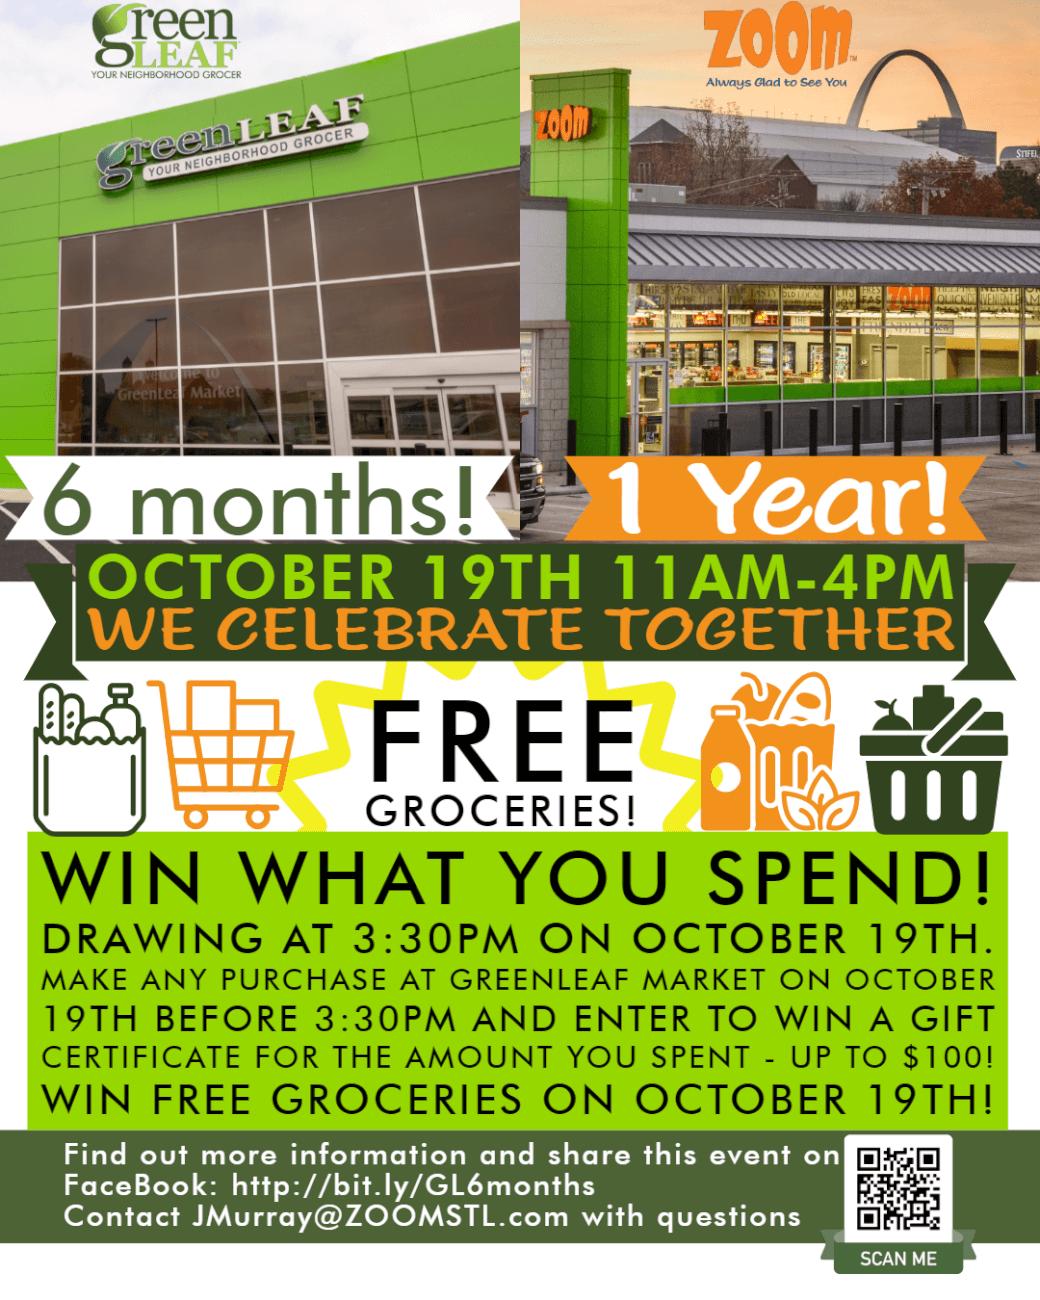 Win free groceries at GreenLeaf Market